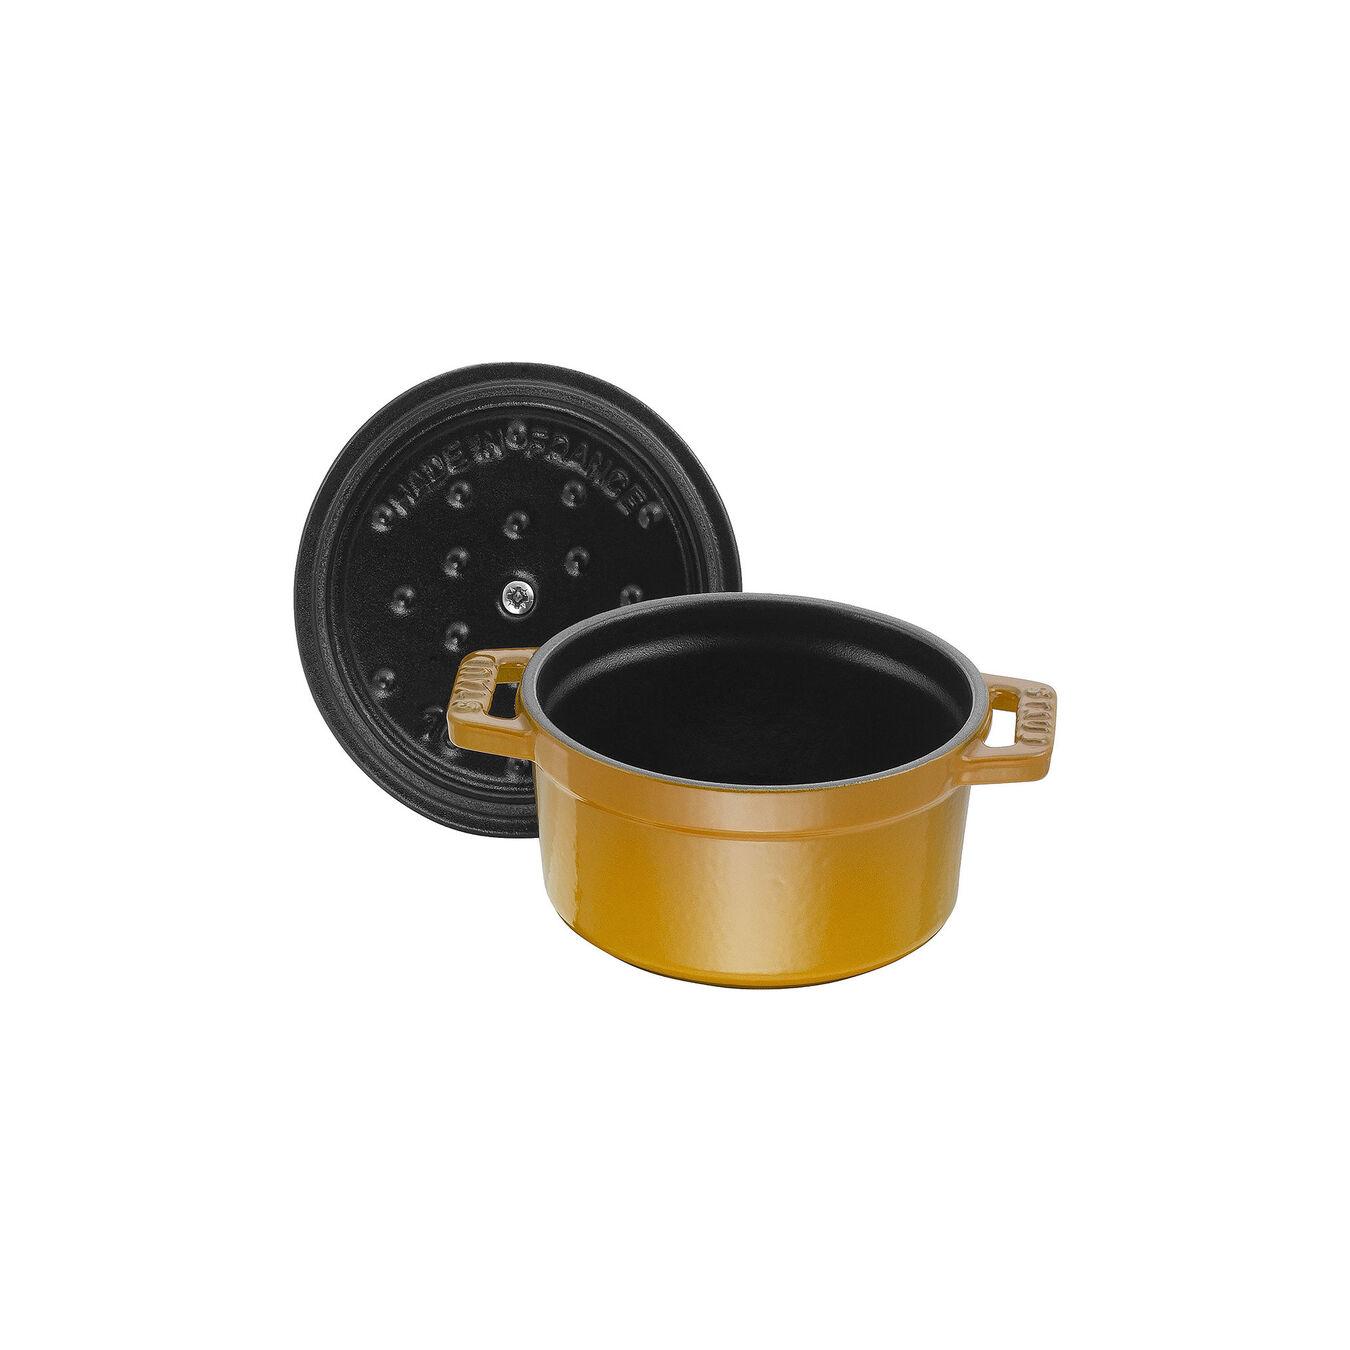 Mini Cocotte 10 cm, Rond(e), Moutarde, Fonte,,large 5